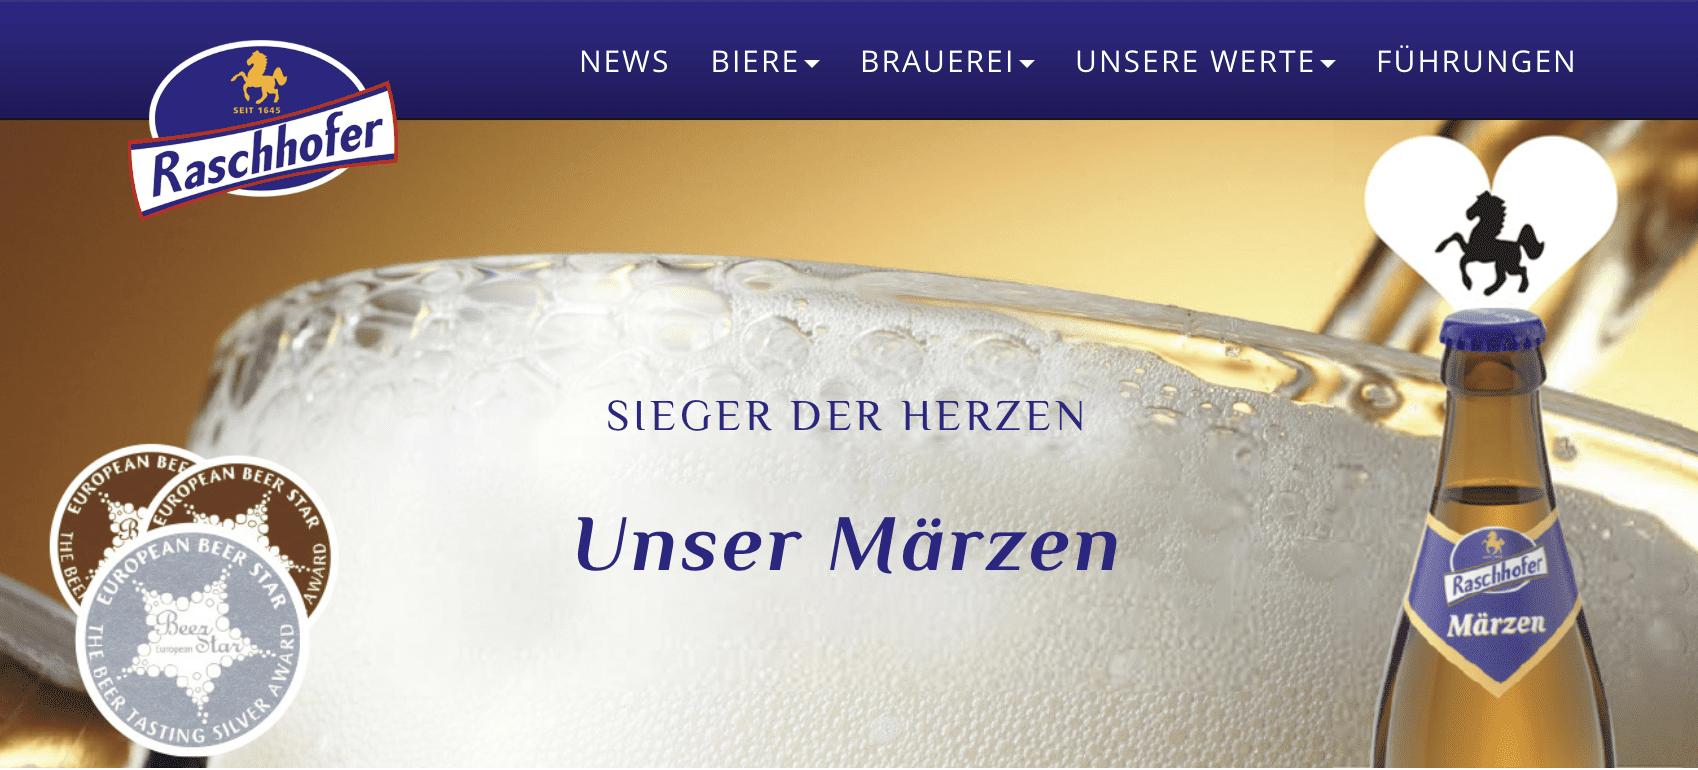 Raschhofer Gewinnspiel-Cases FMCG Getränke